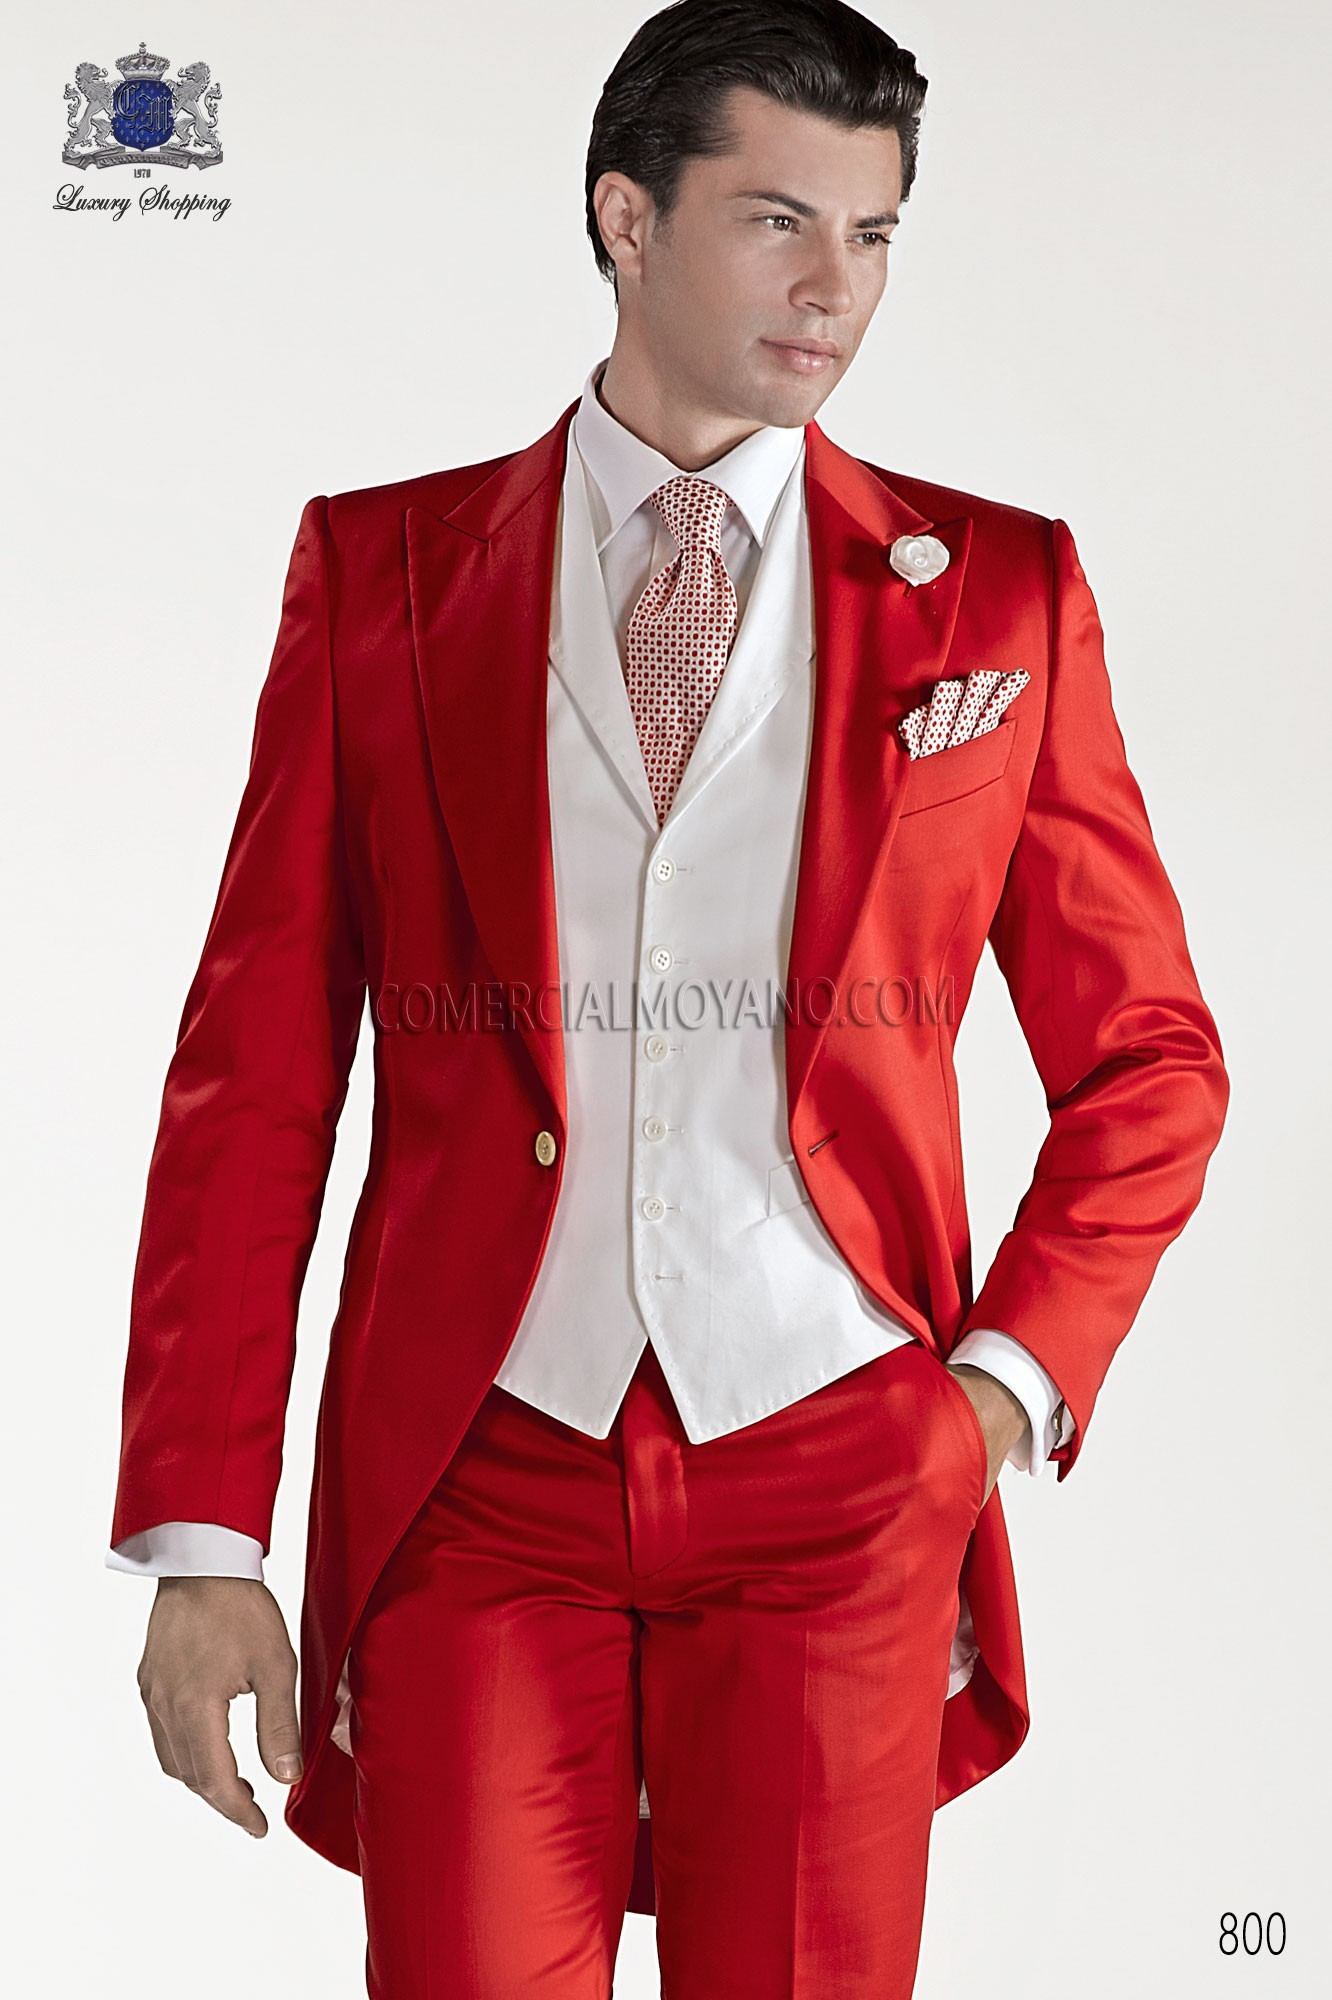 Traje Hipster de novio rojo modelo: 800 Ottavio Nuccio Gala colección Hipster 2017